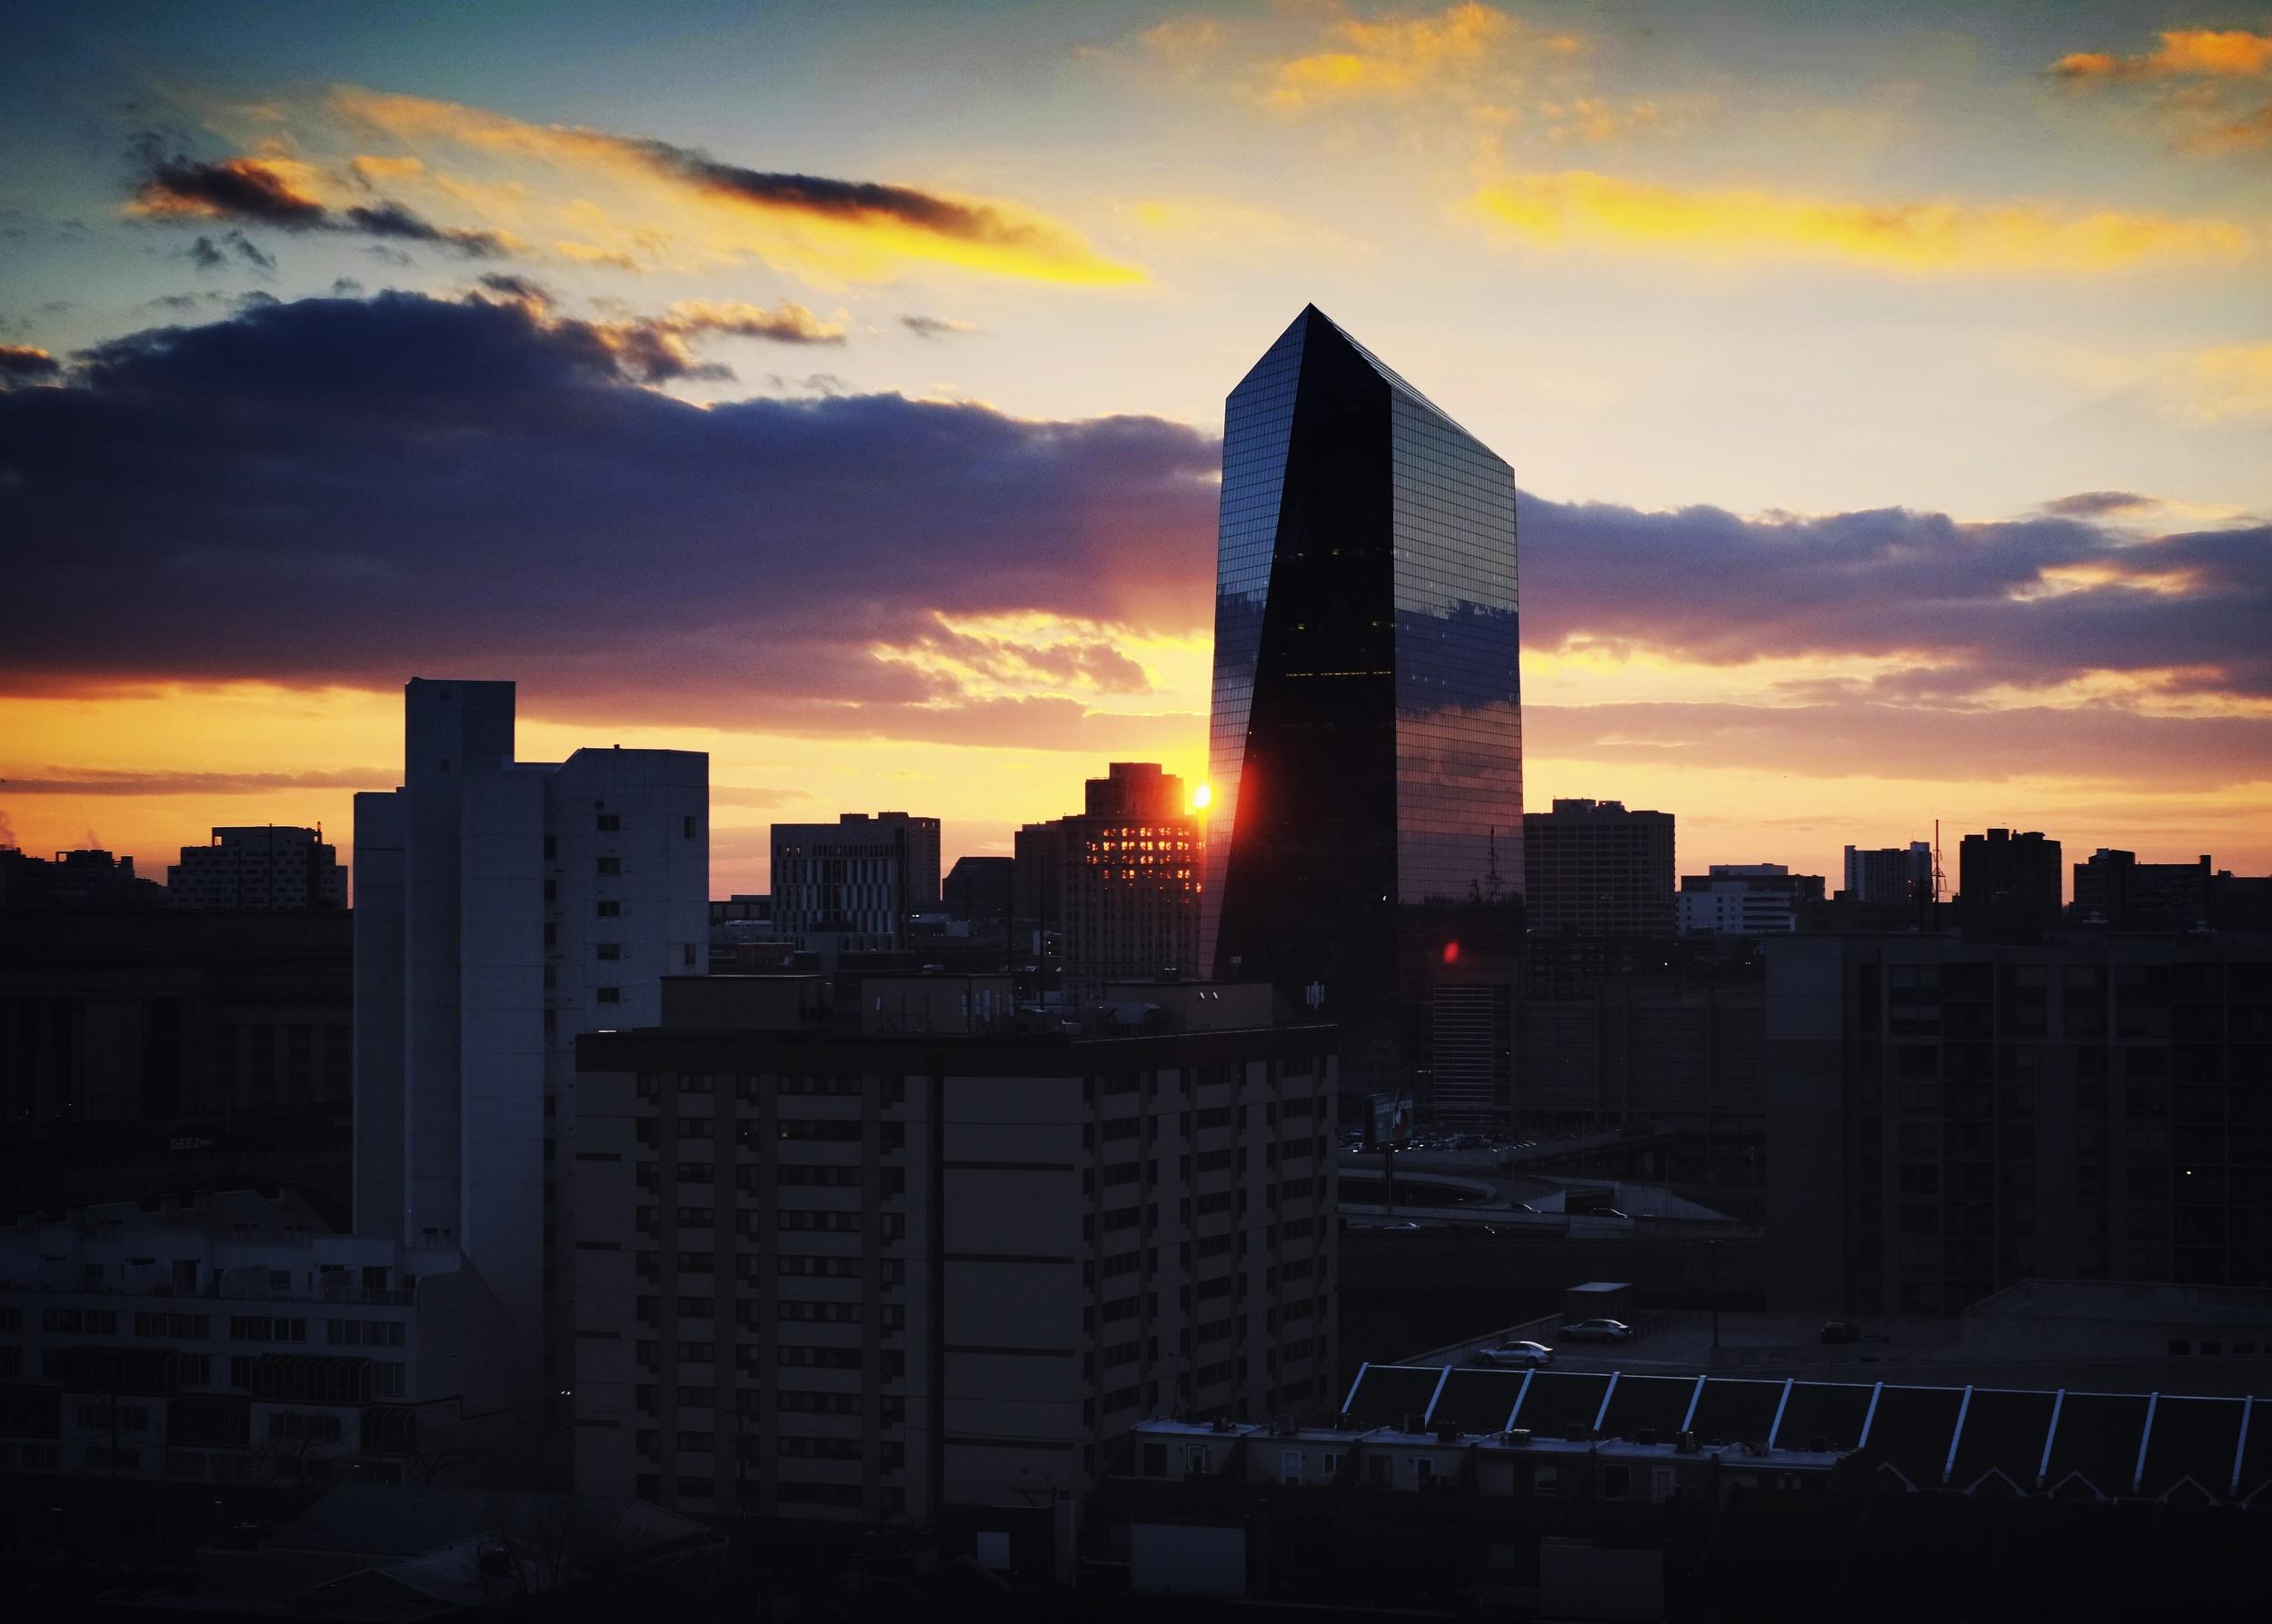 Monday's sunset in Philadelphia.